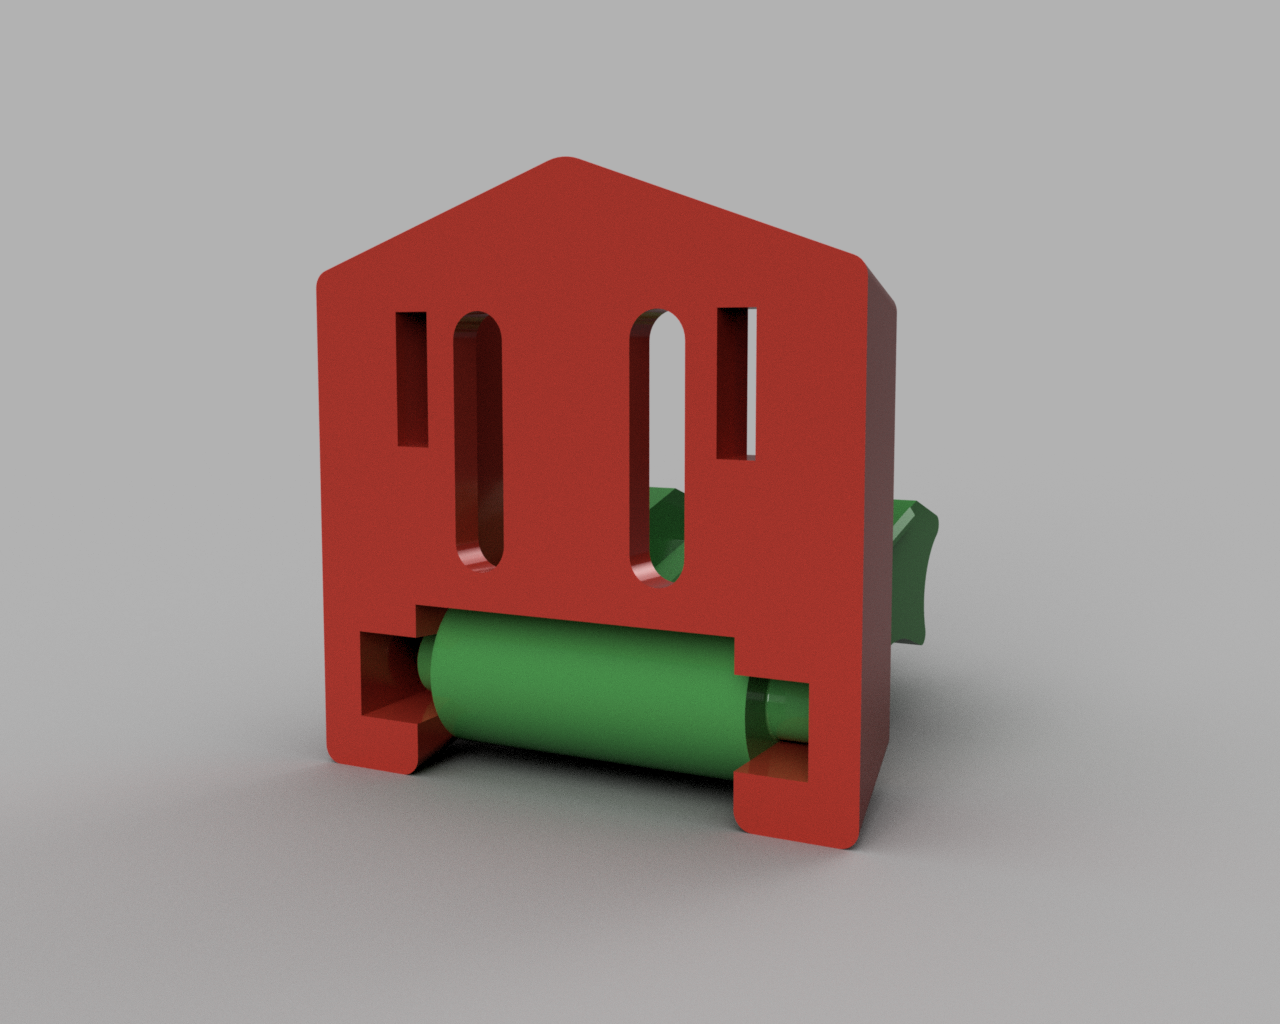 support umbird under.png Download STL file Humminbird 525 echo sounder • Template to 3D print, francknos